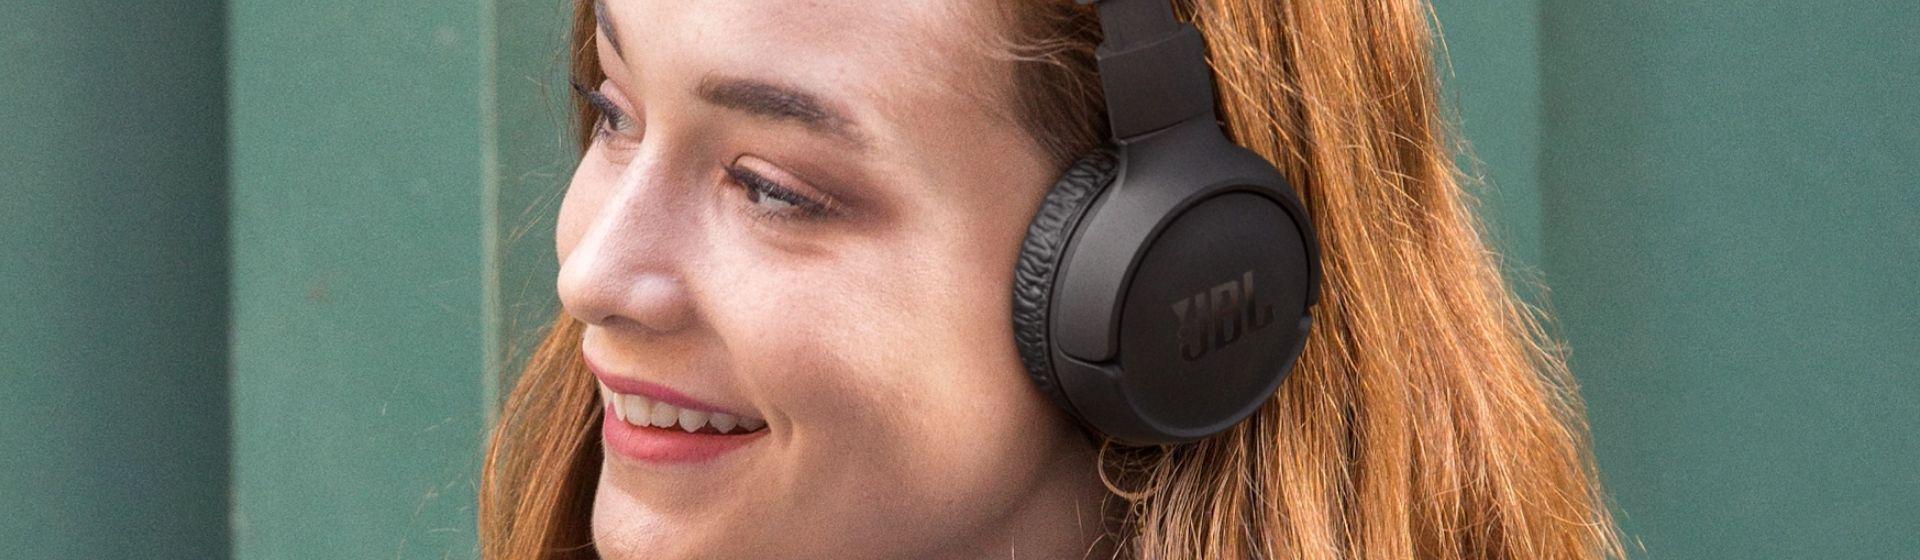 JBL Tune 510BT: fone de ouvido promete até 40h de autonomia de bateria